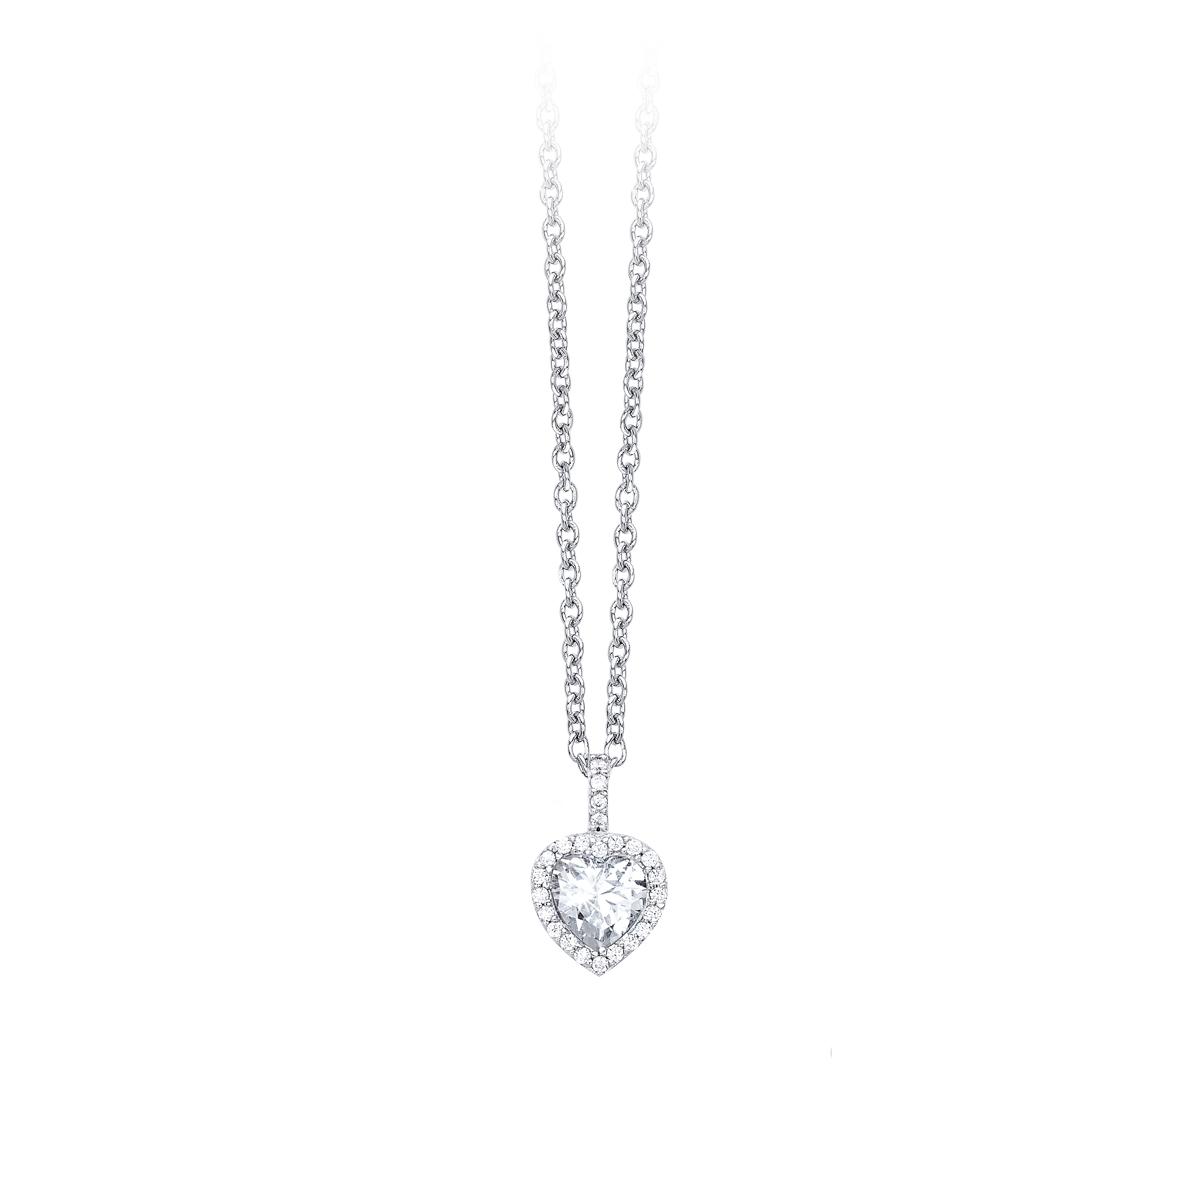 Collana pendente punto luce cuore con contorno zirconi in argento